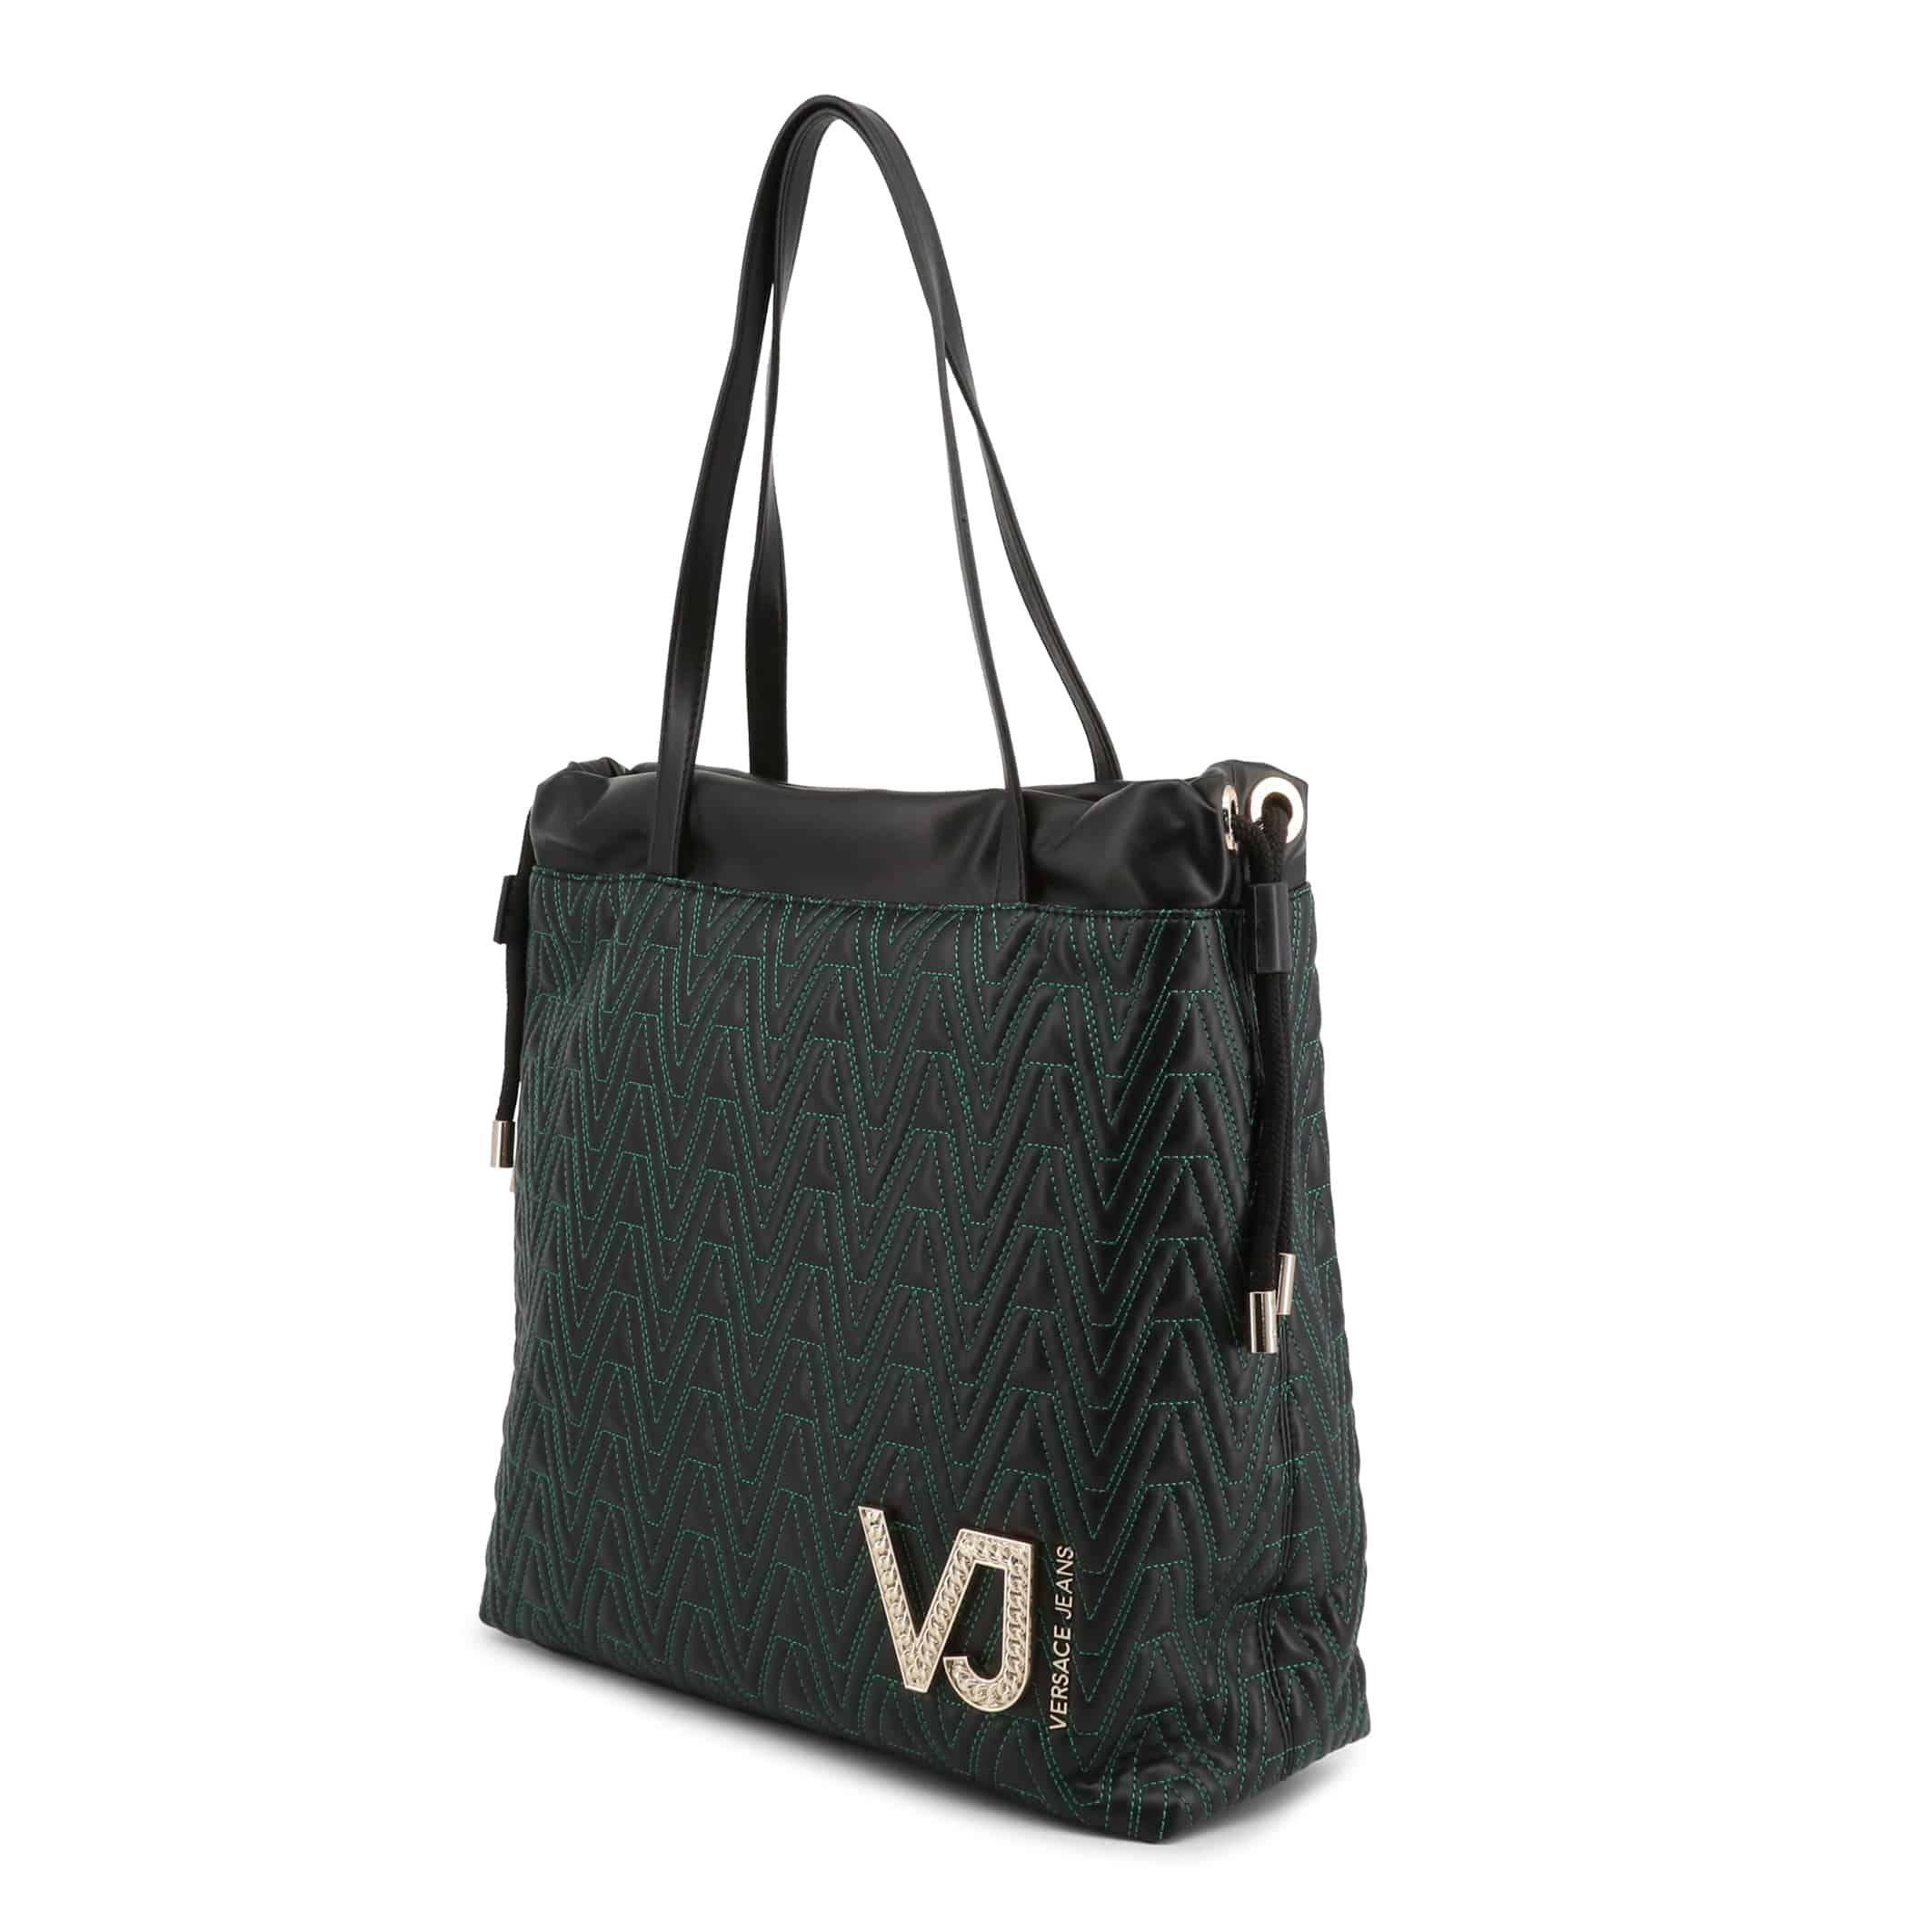 Versace Jeans – E1VSBBI3_70784